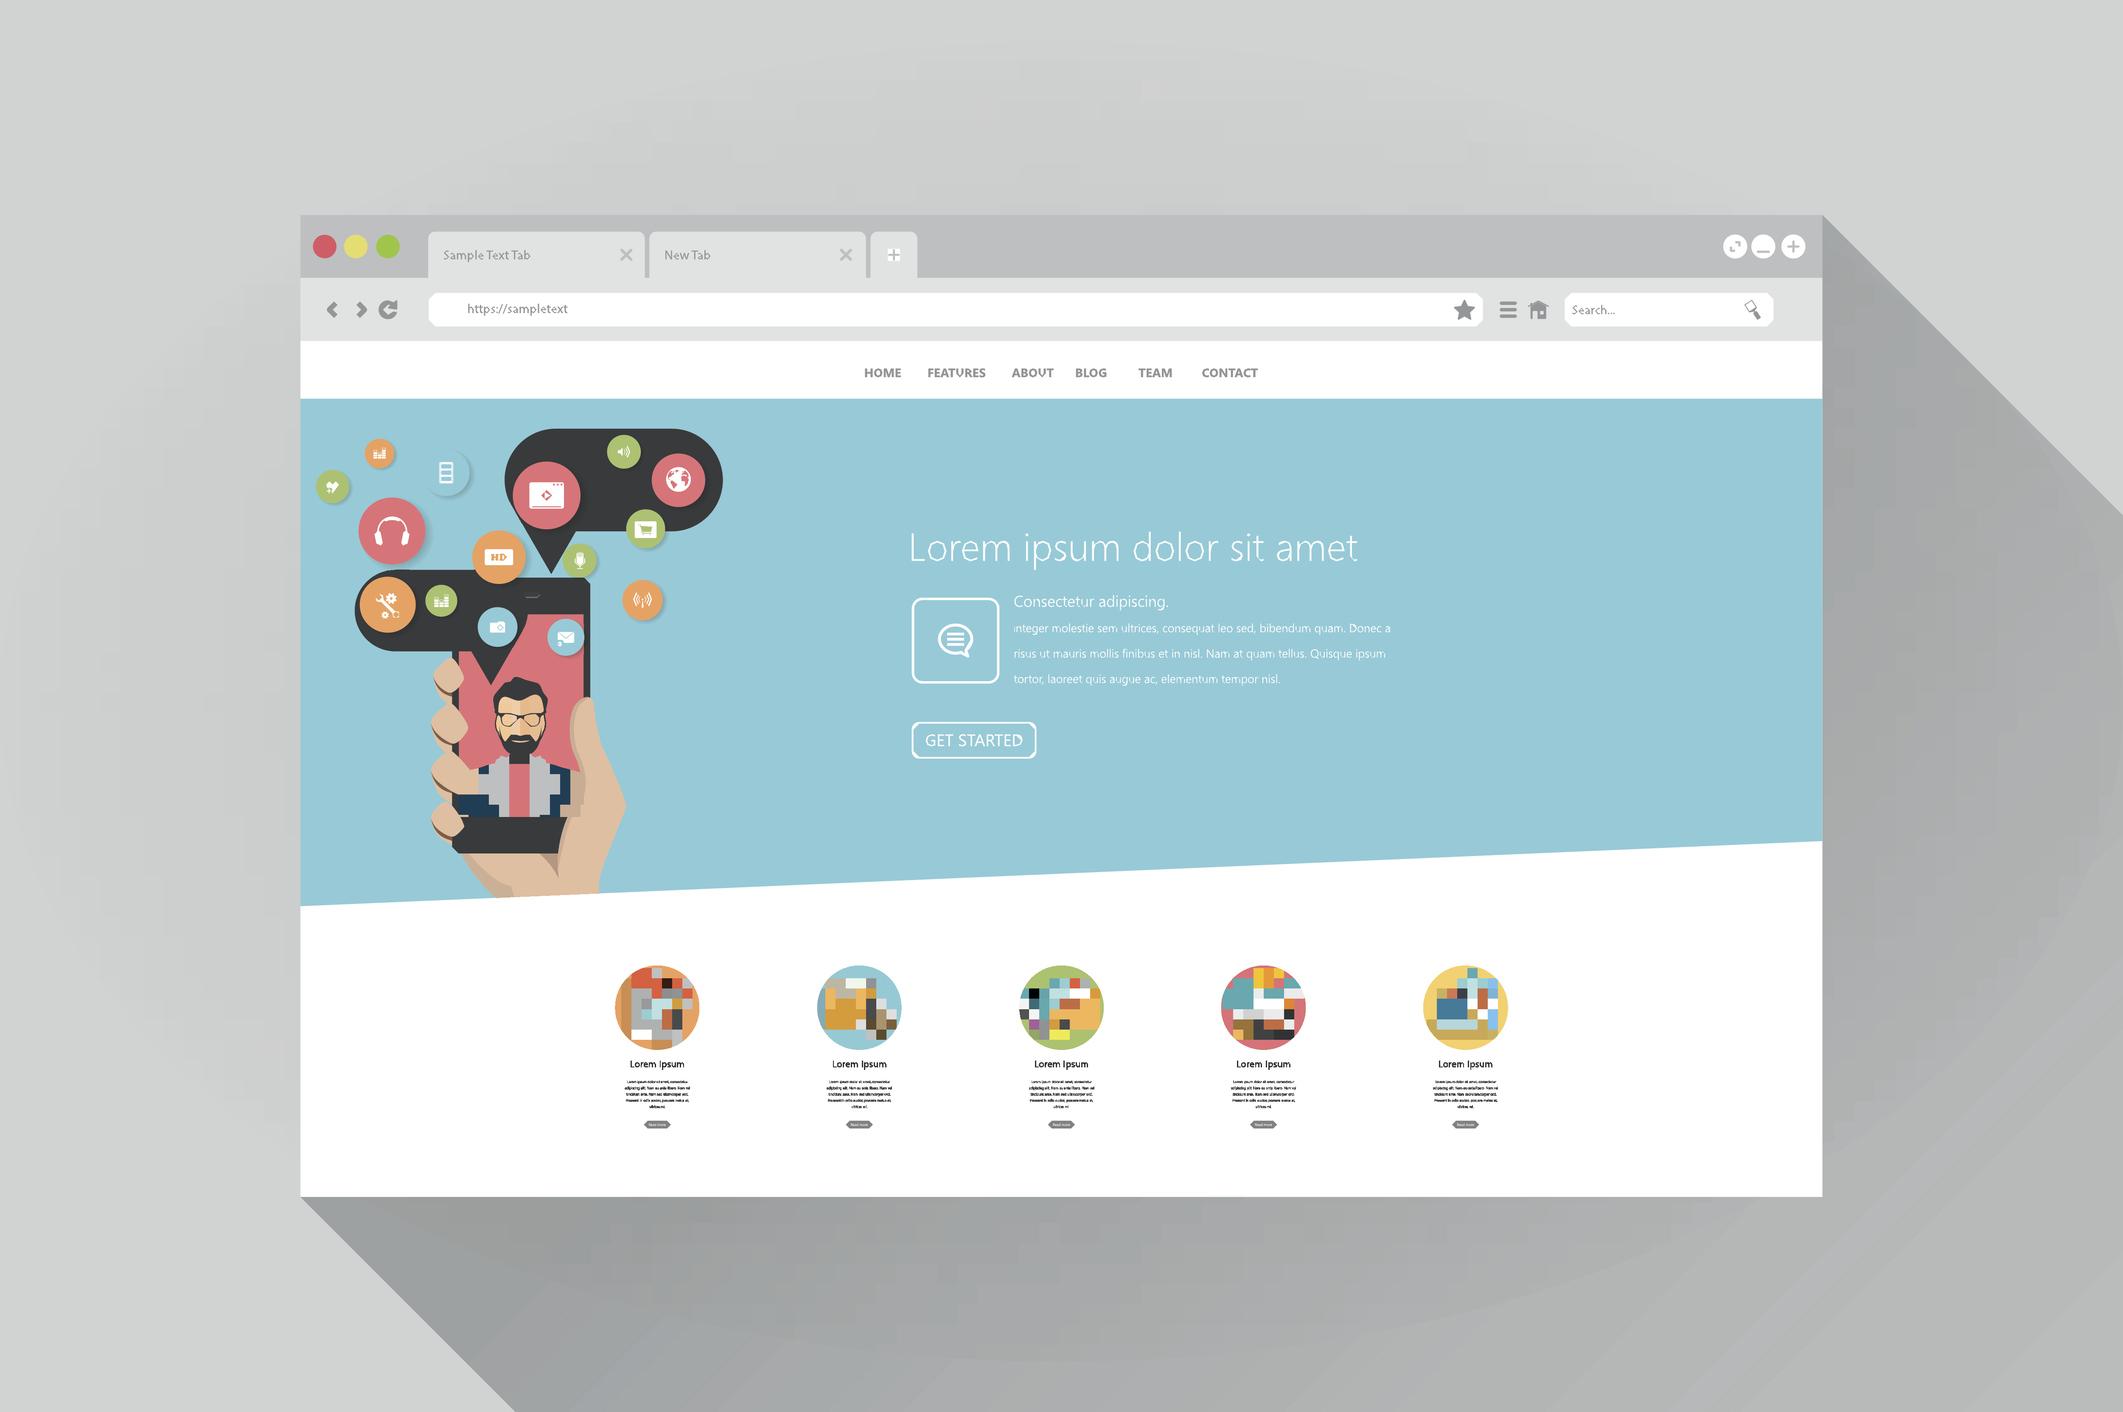 Why Use a Browser-Based Website Builder?